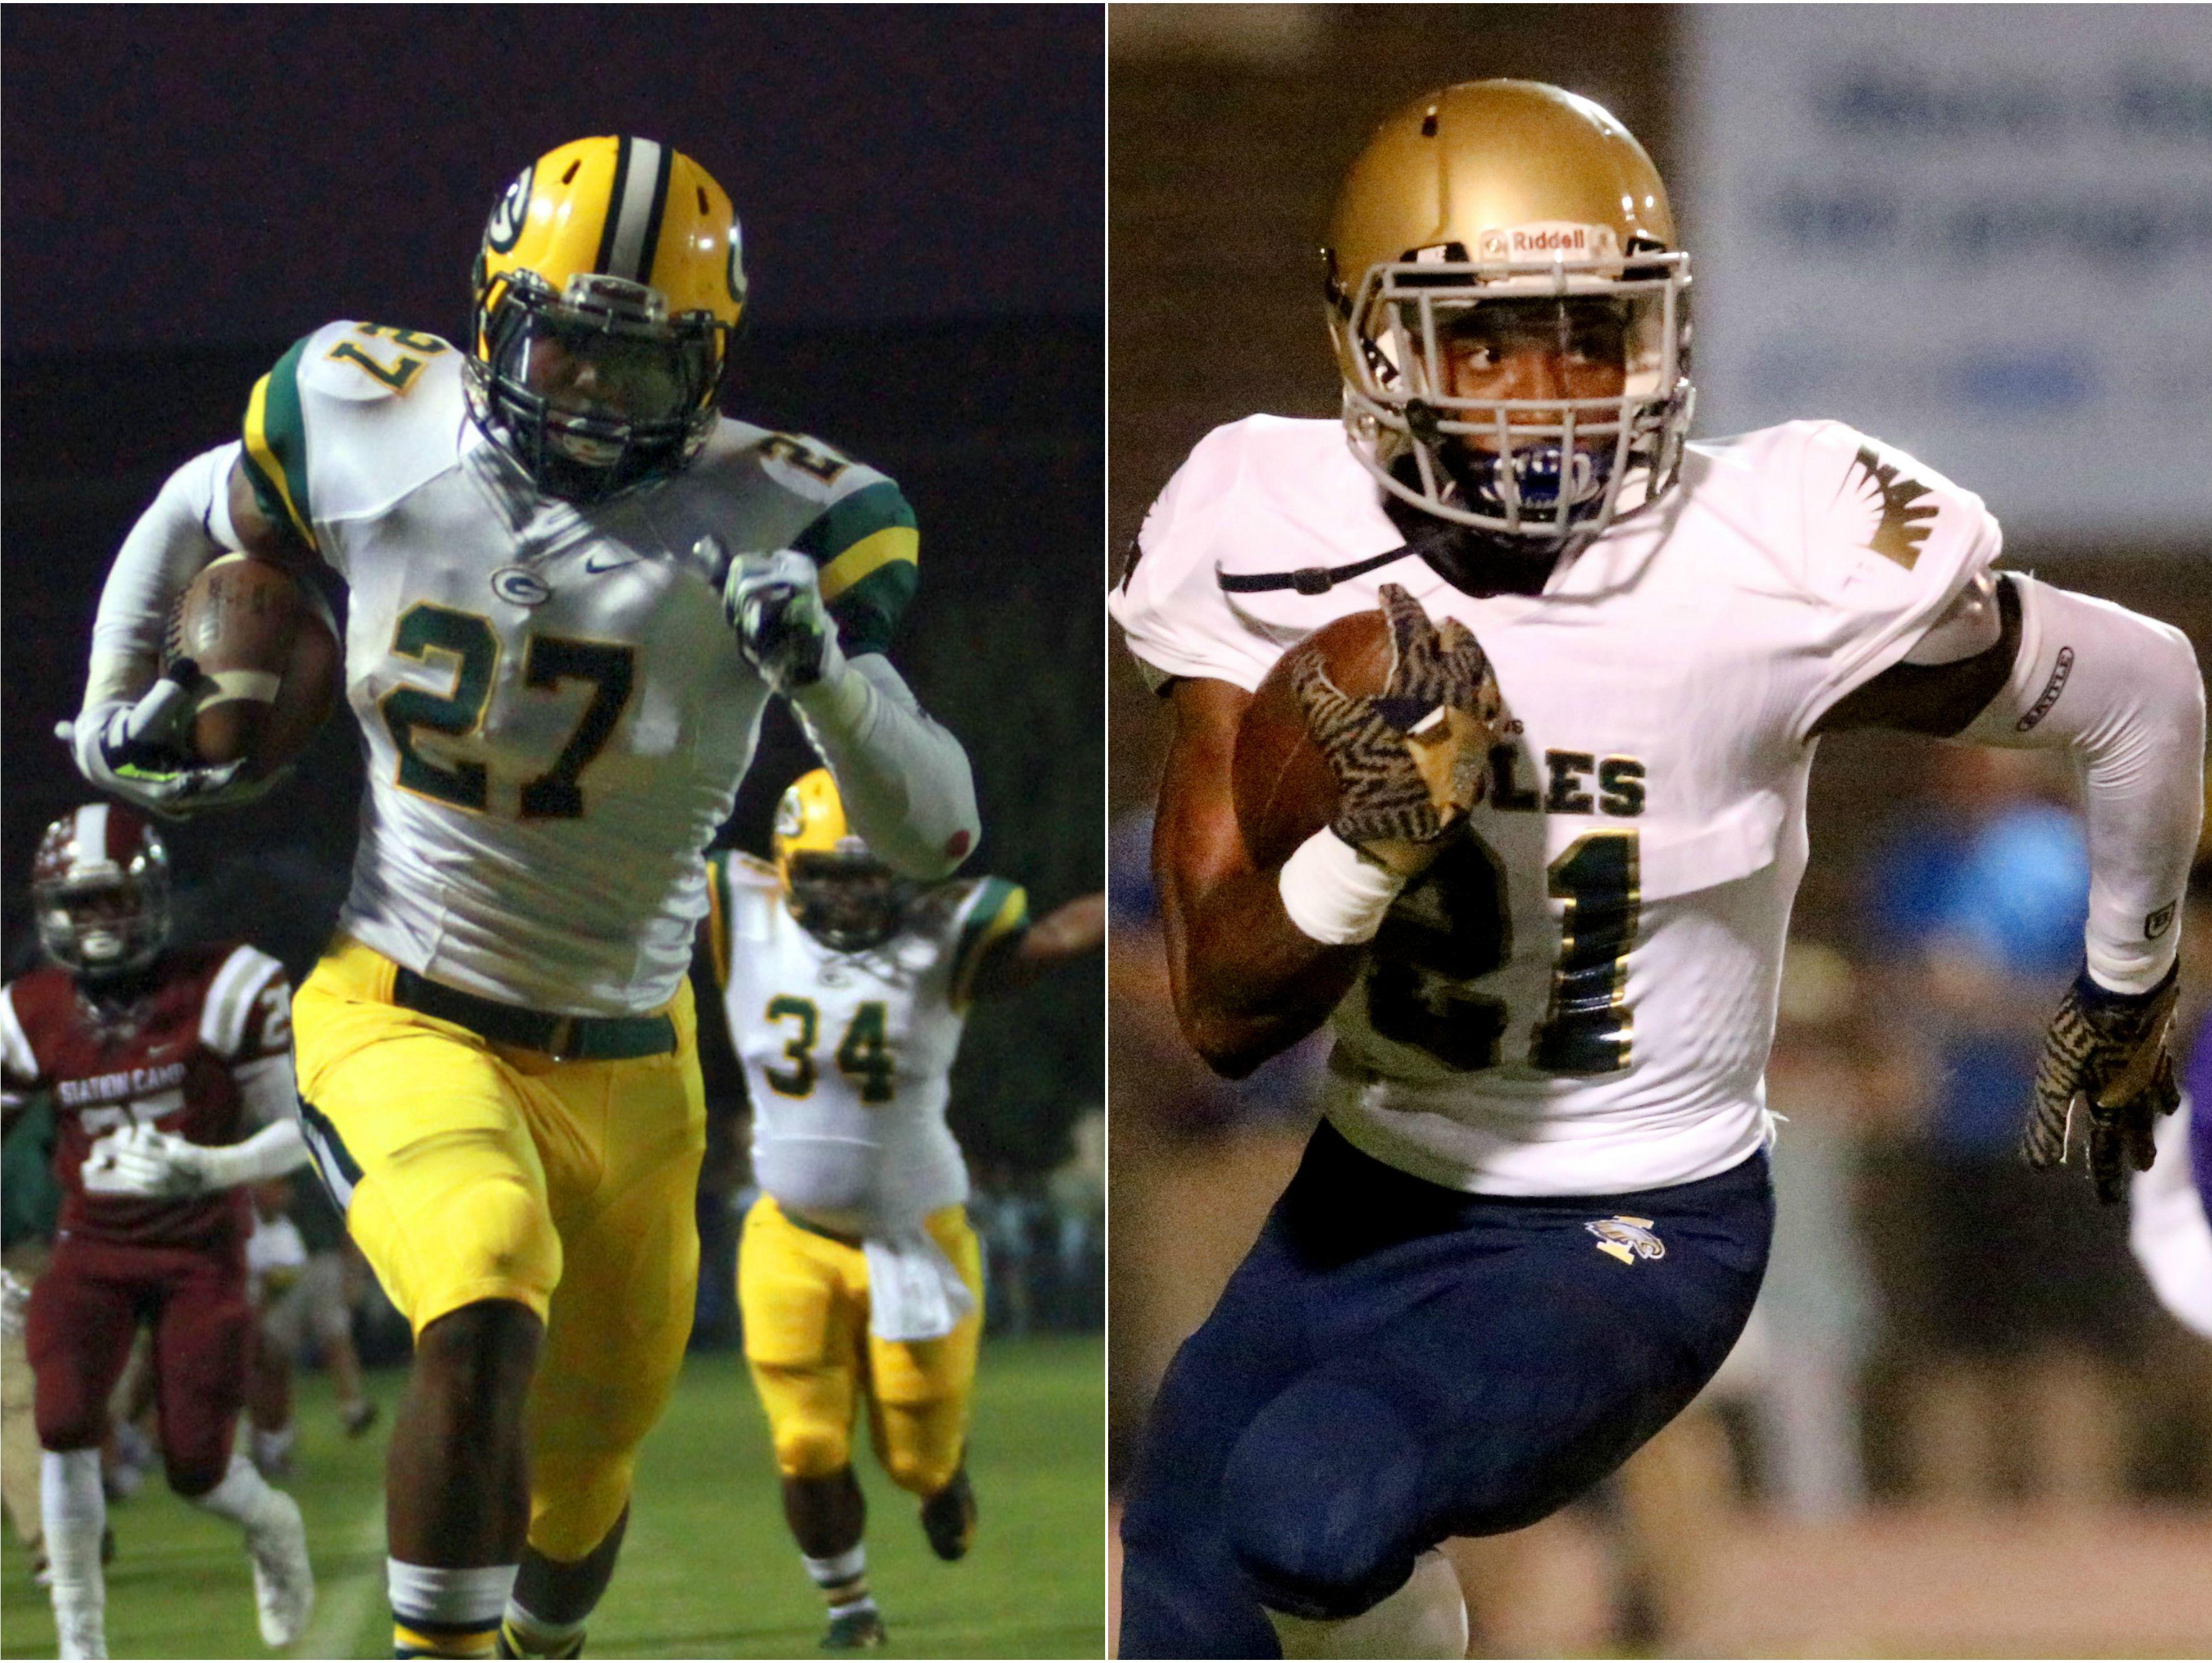 Gallatin running back Jordan Mason (left) and Independence running back Troy Henderson (right)